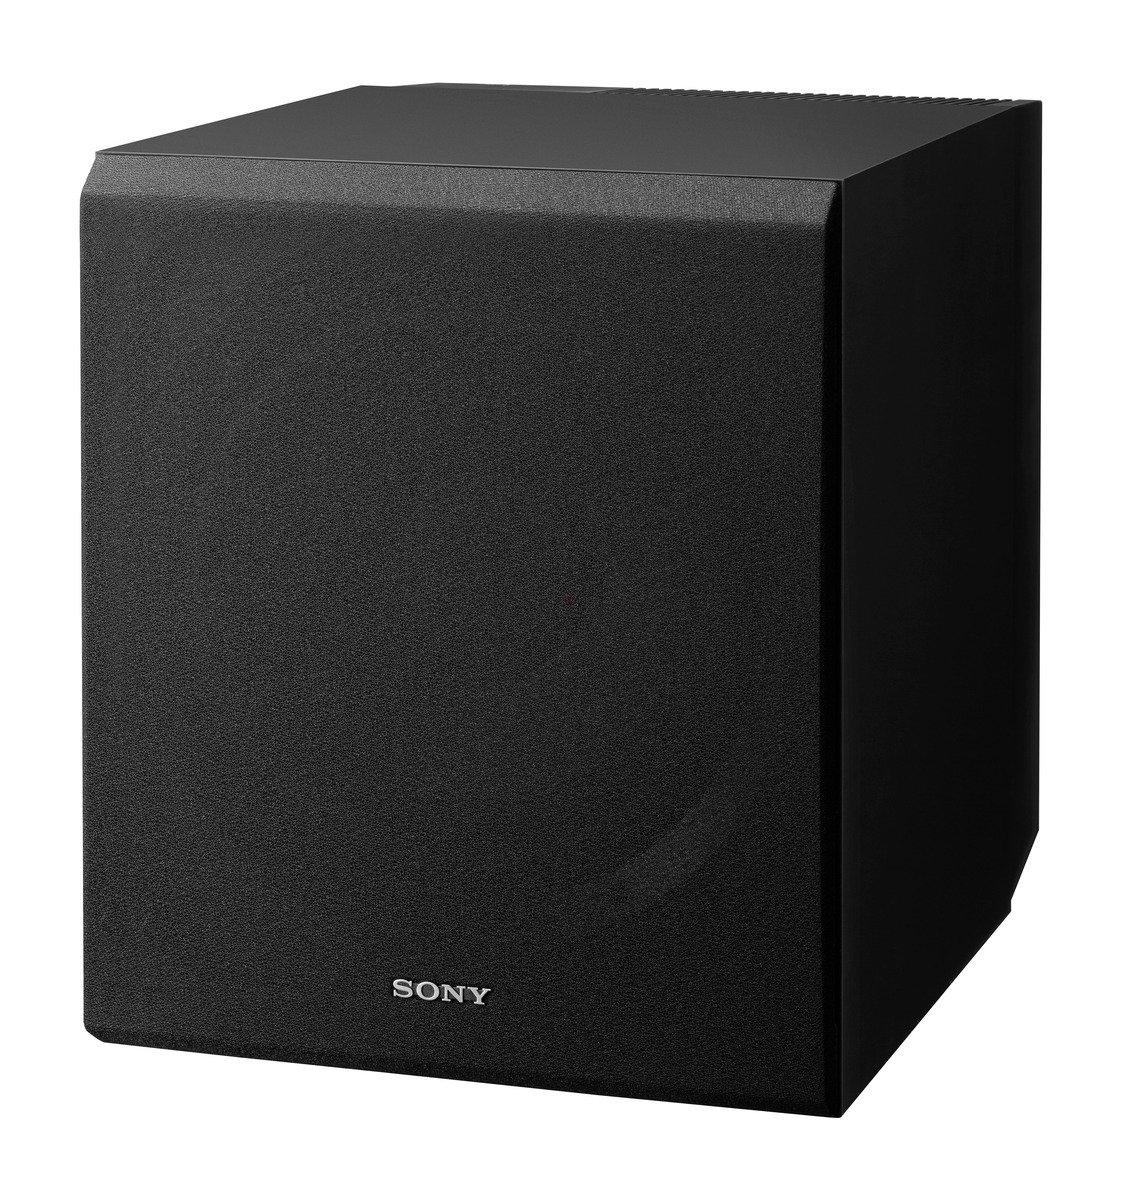 Sony Speaker System Amazon Sale On 4 Different Sony